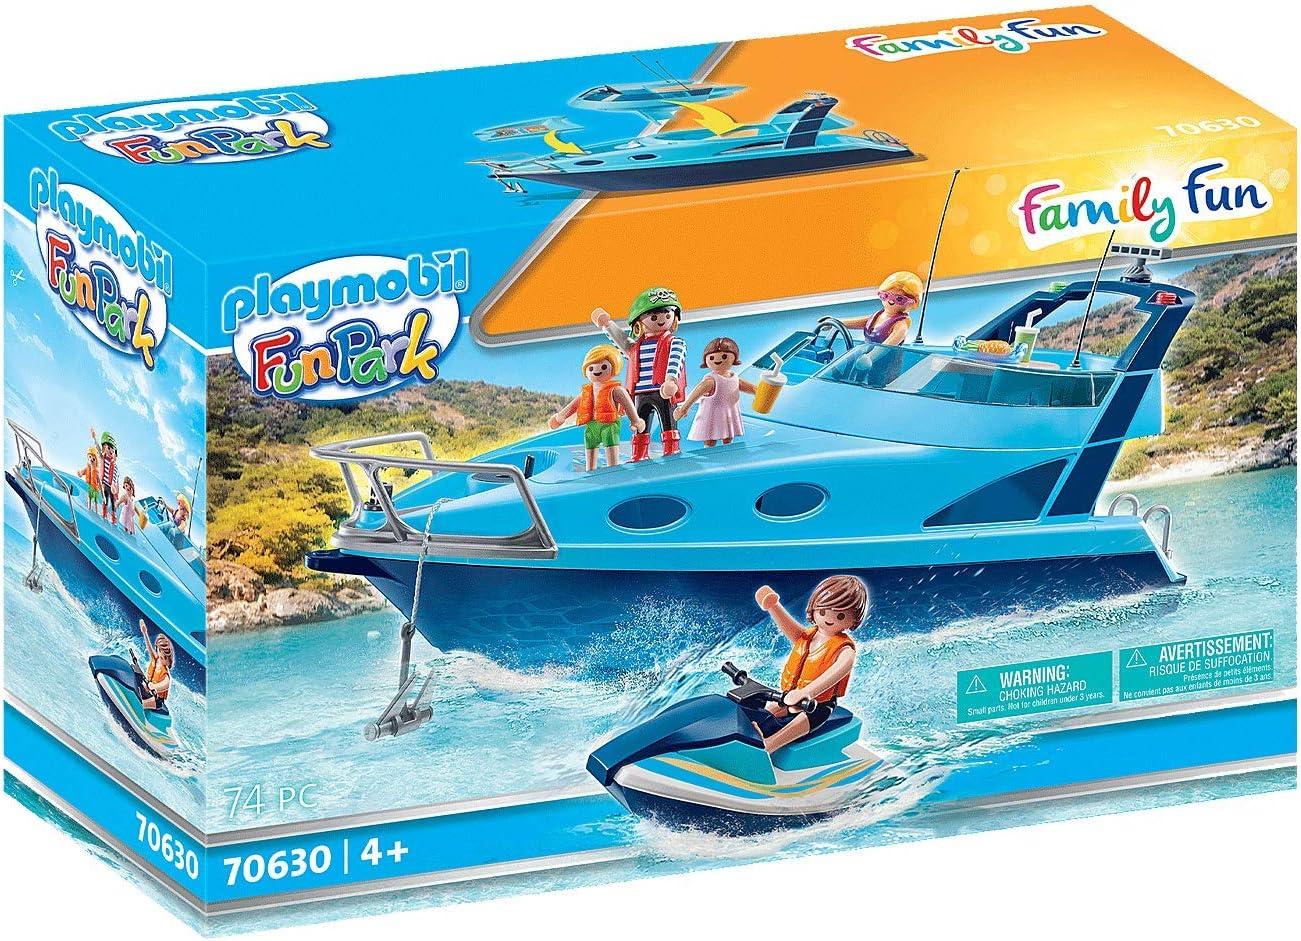 PLAYMOBL-FunPark 70630 - Yate con Moto de Agua